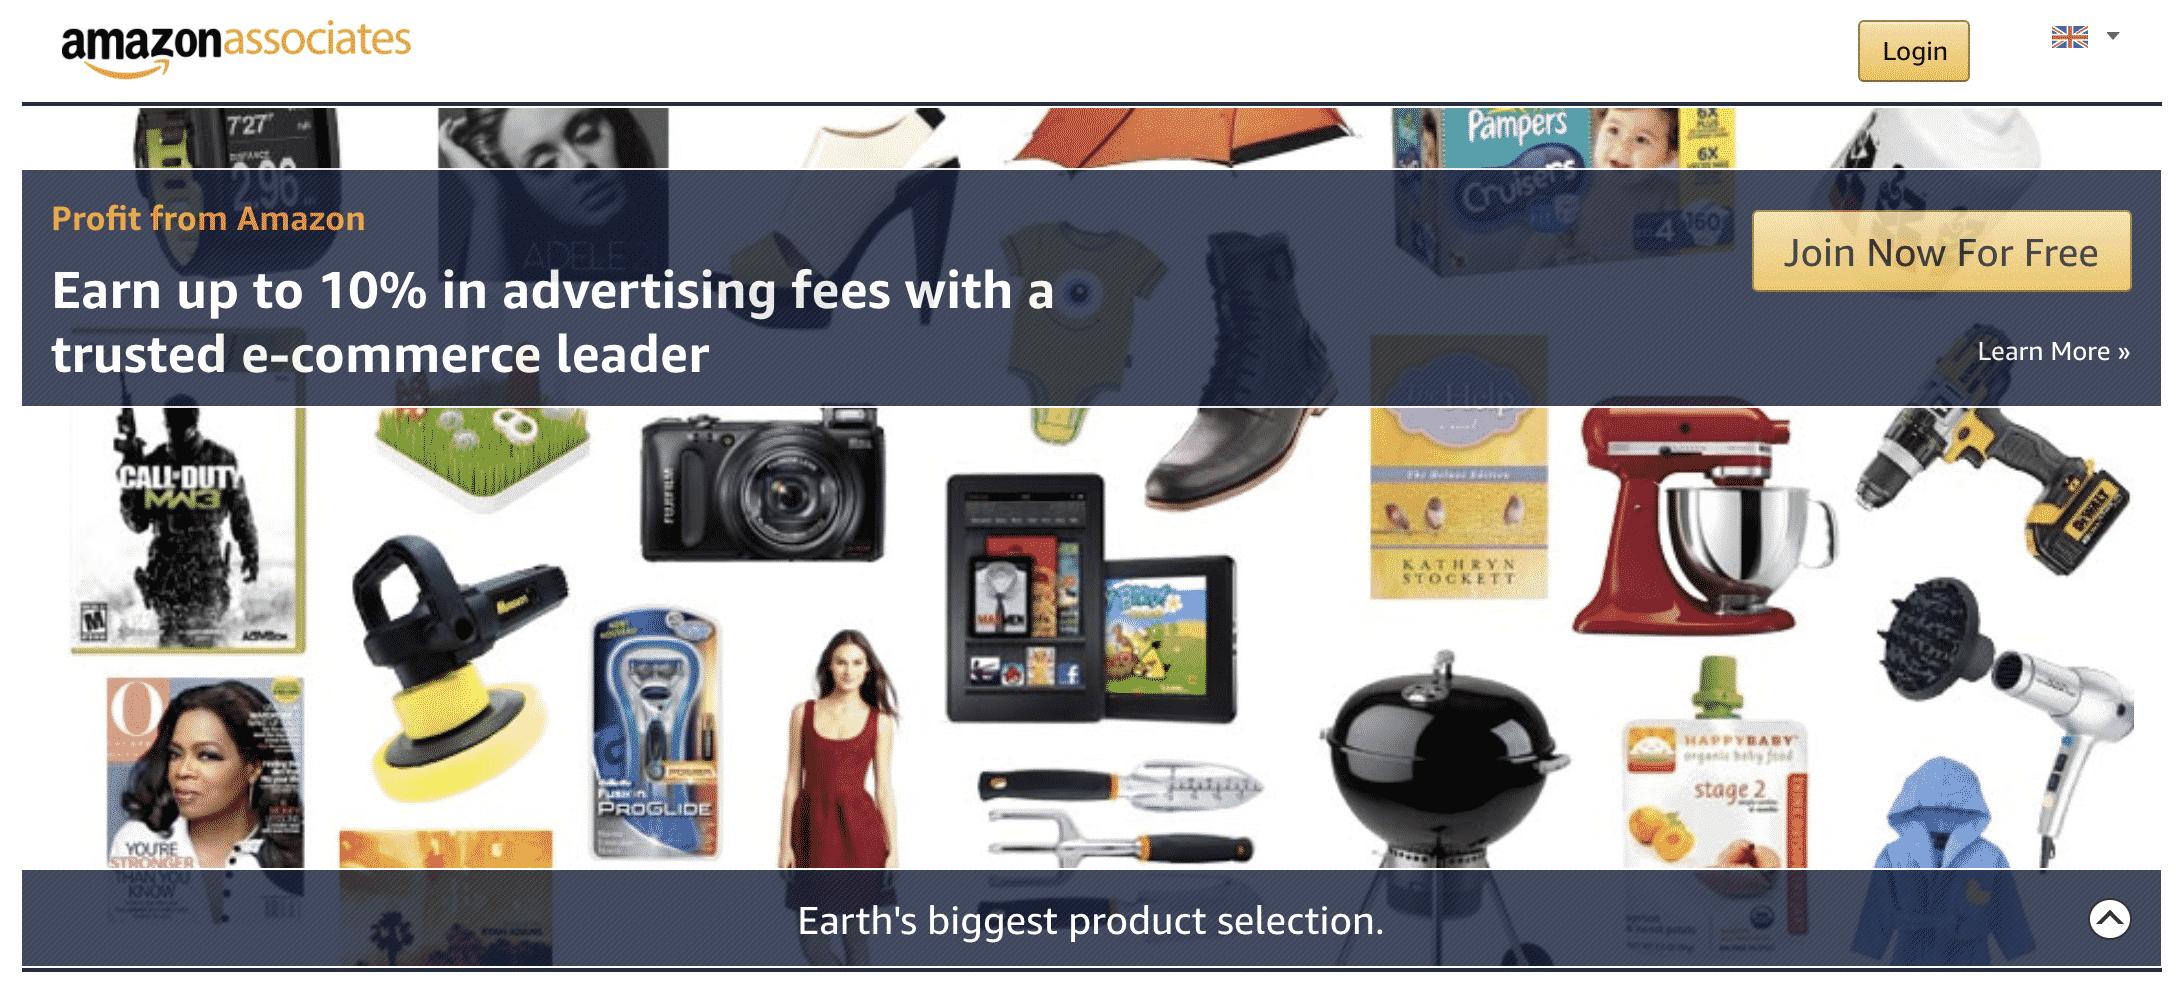 Top 5 Affiliate Marketing Websites & Programs For 2019